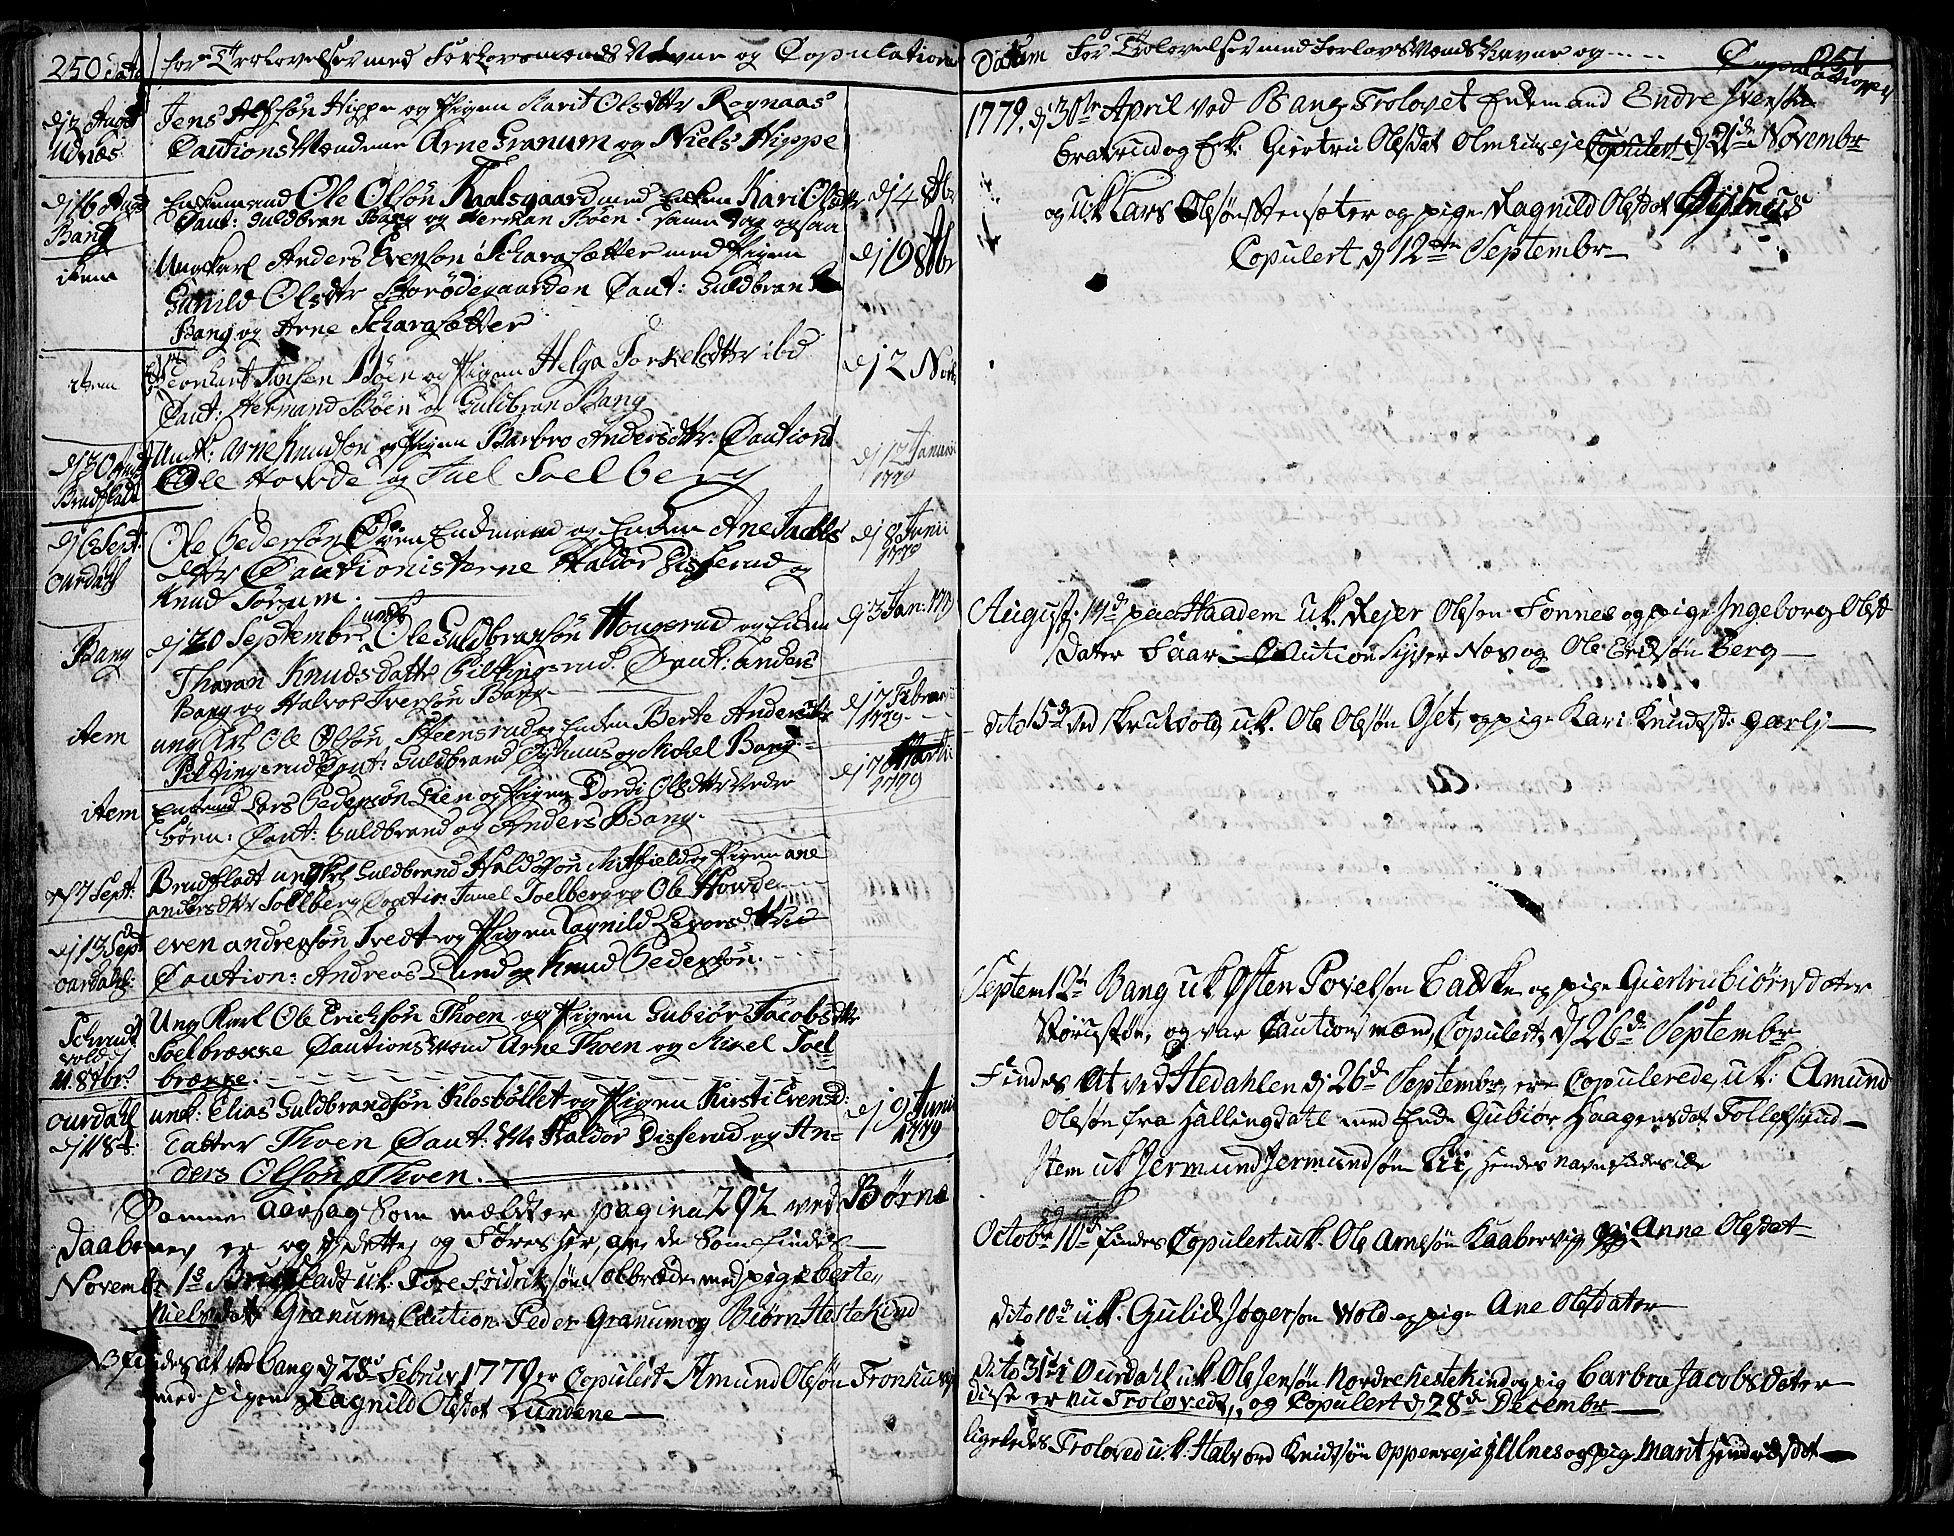 SAH, Aurdal prestekontor, Ministerialbok nr. 5, 1763-1781, s. 250-251